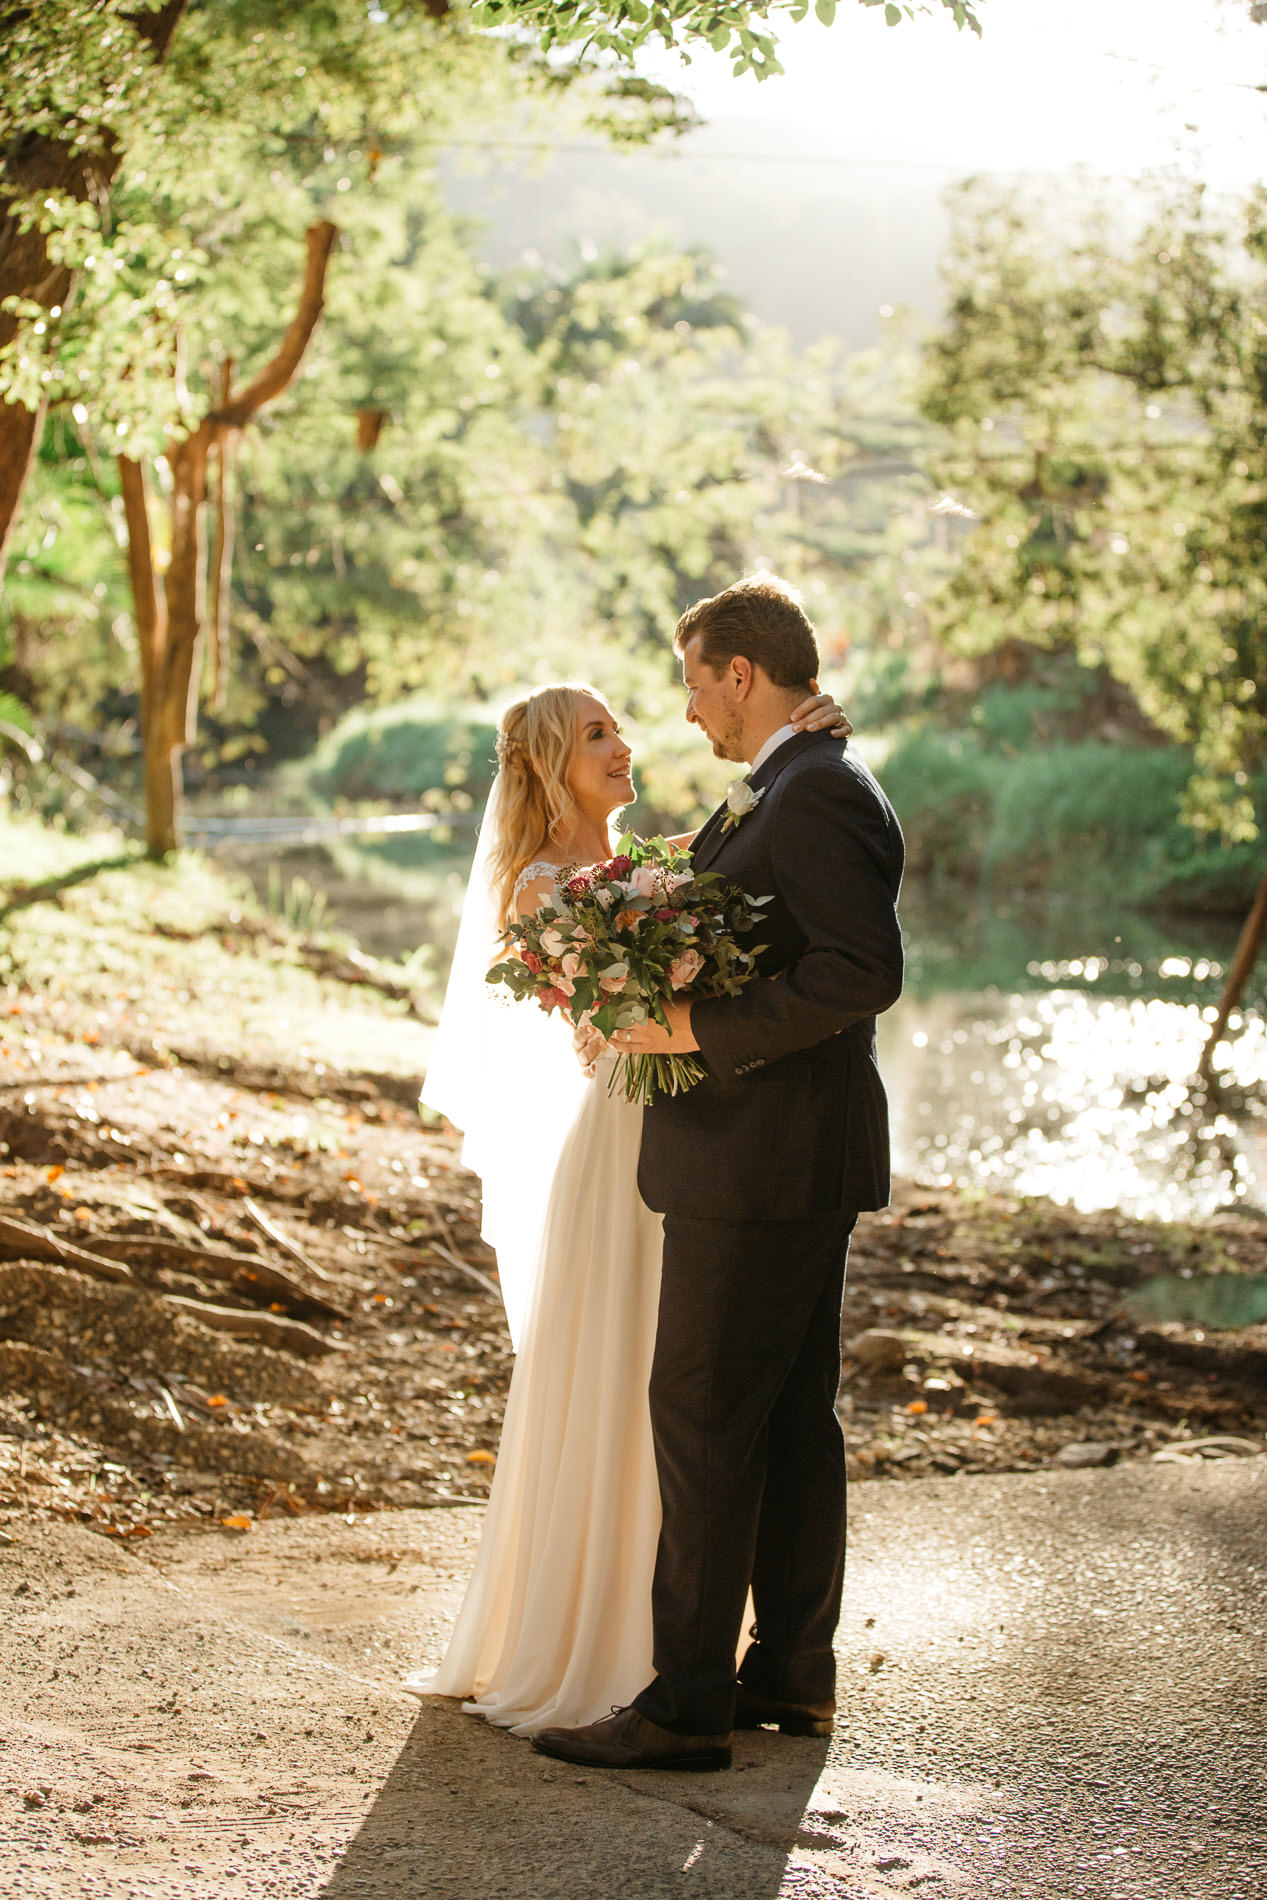 True North Photography_Boomerang Farm_Stacey and Isaac_Gold Coast Wedding_Barm Wedding_Hinterland Wedding-136.jpg